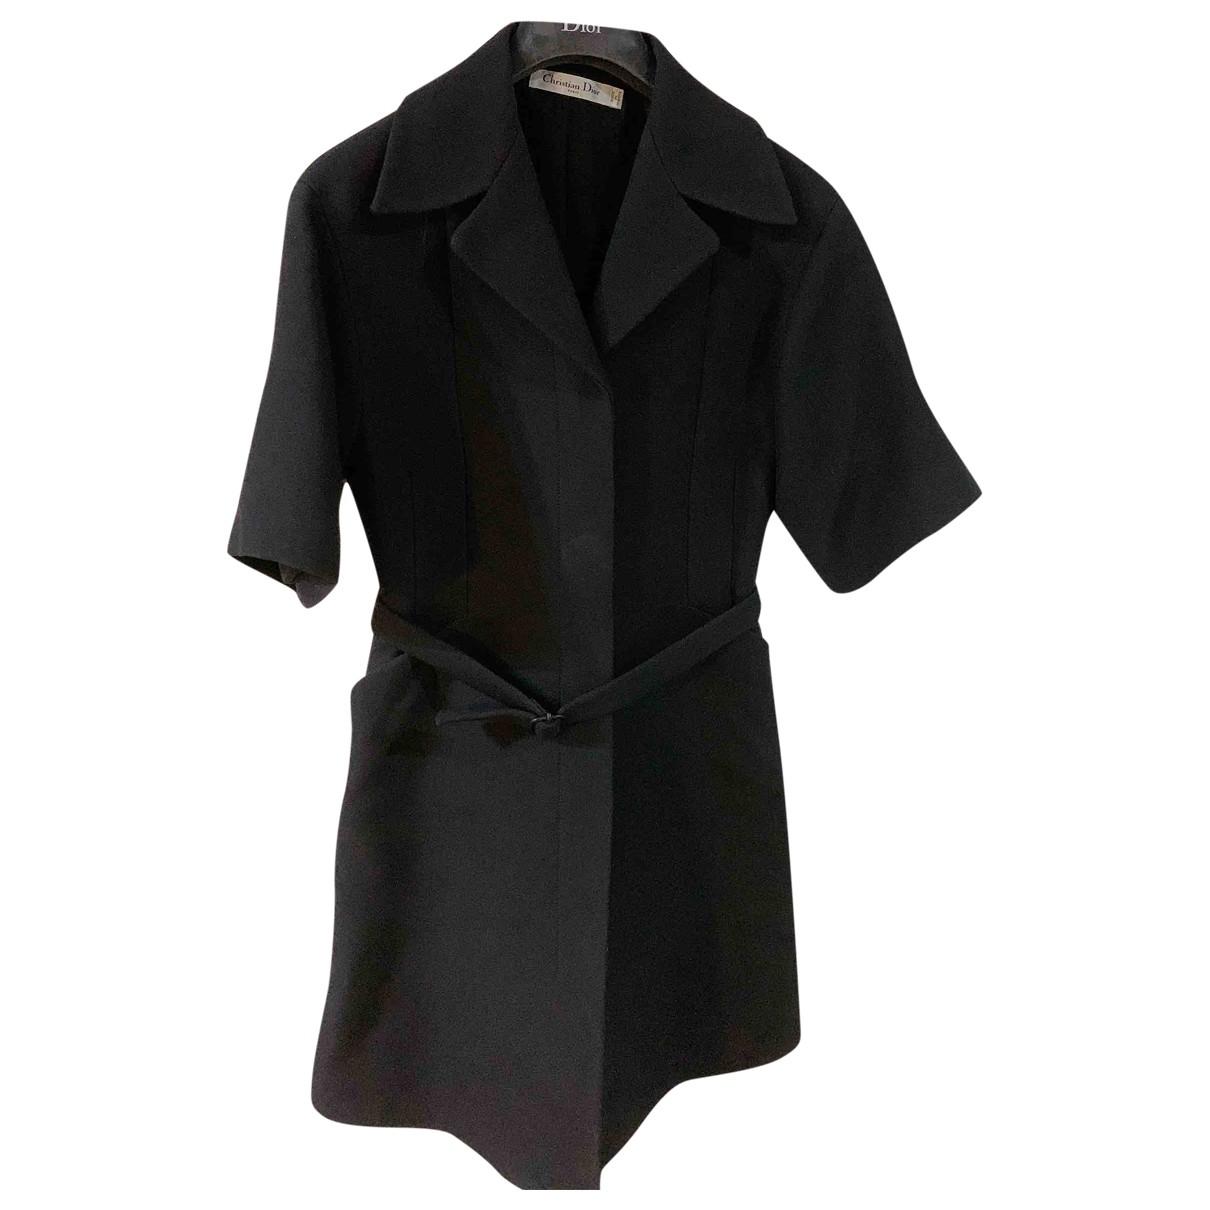 Dior \N Black Wool jacket for Women 34 FR